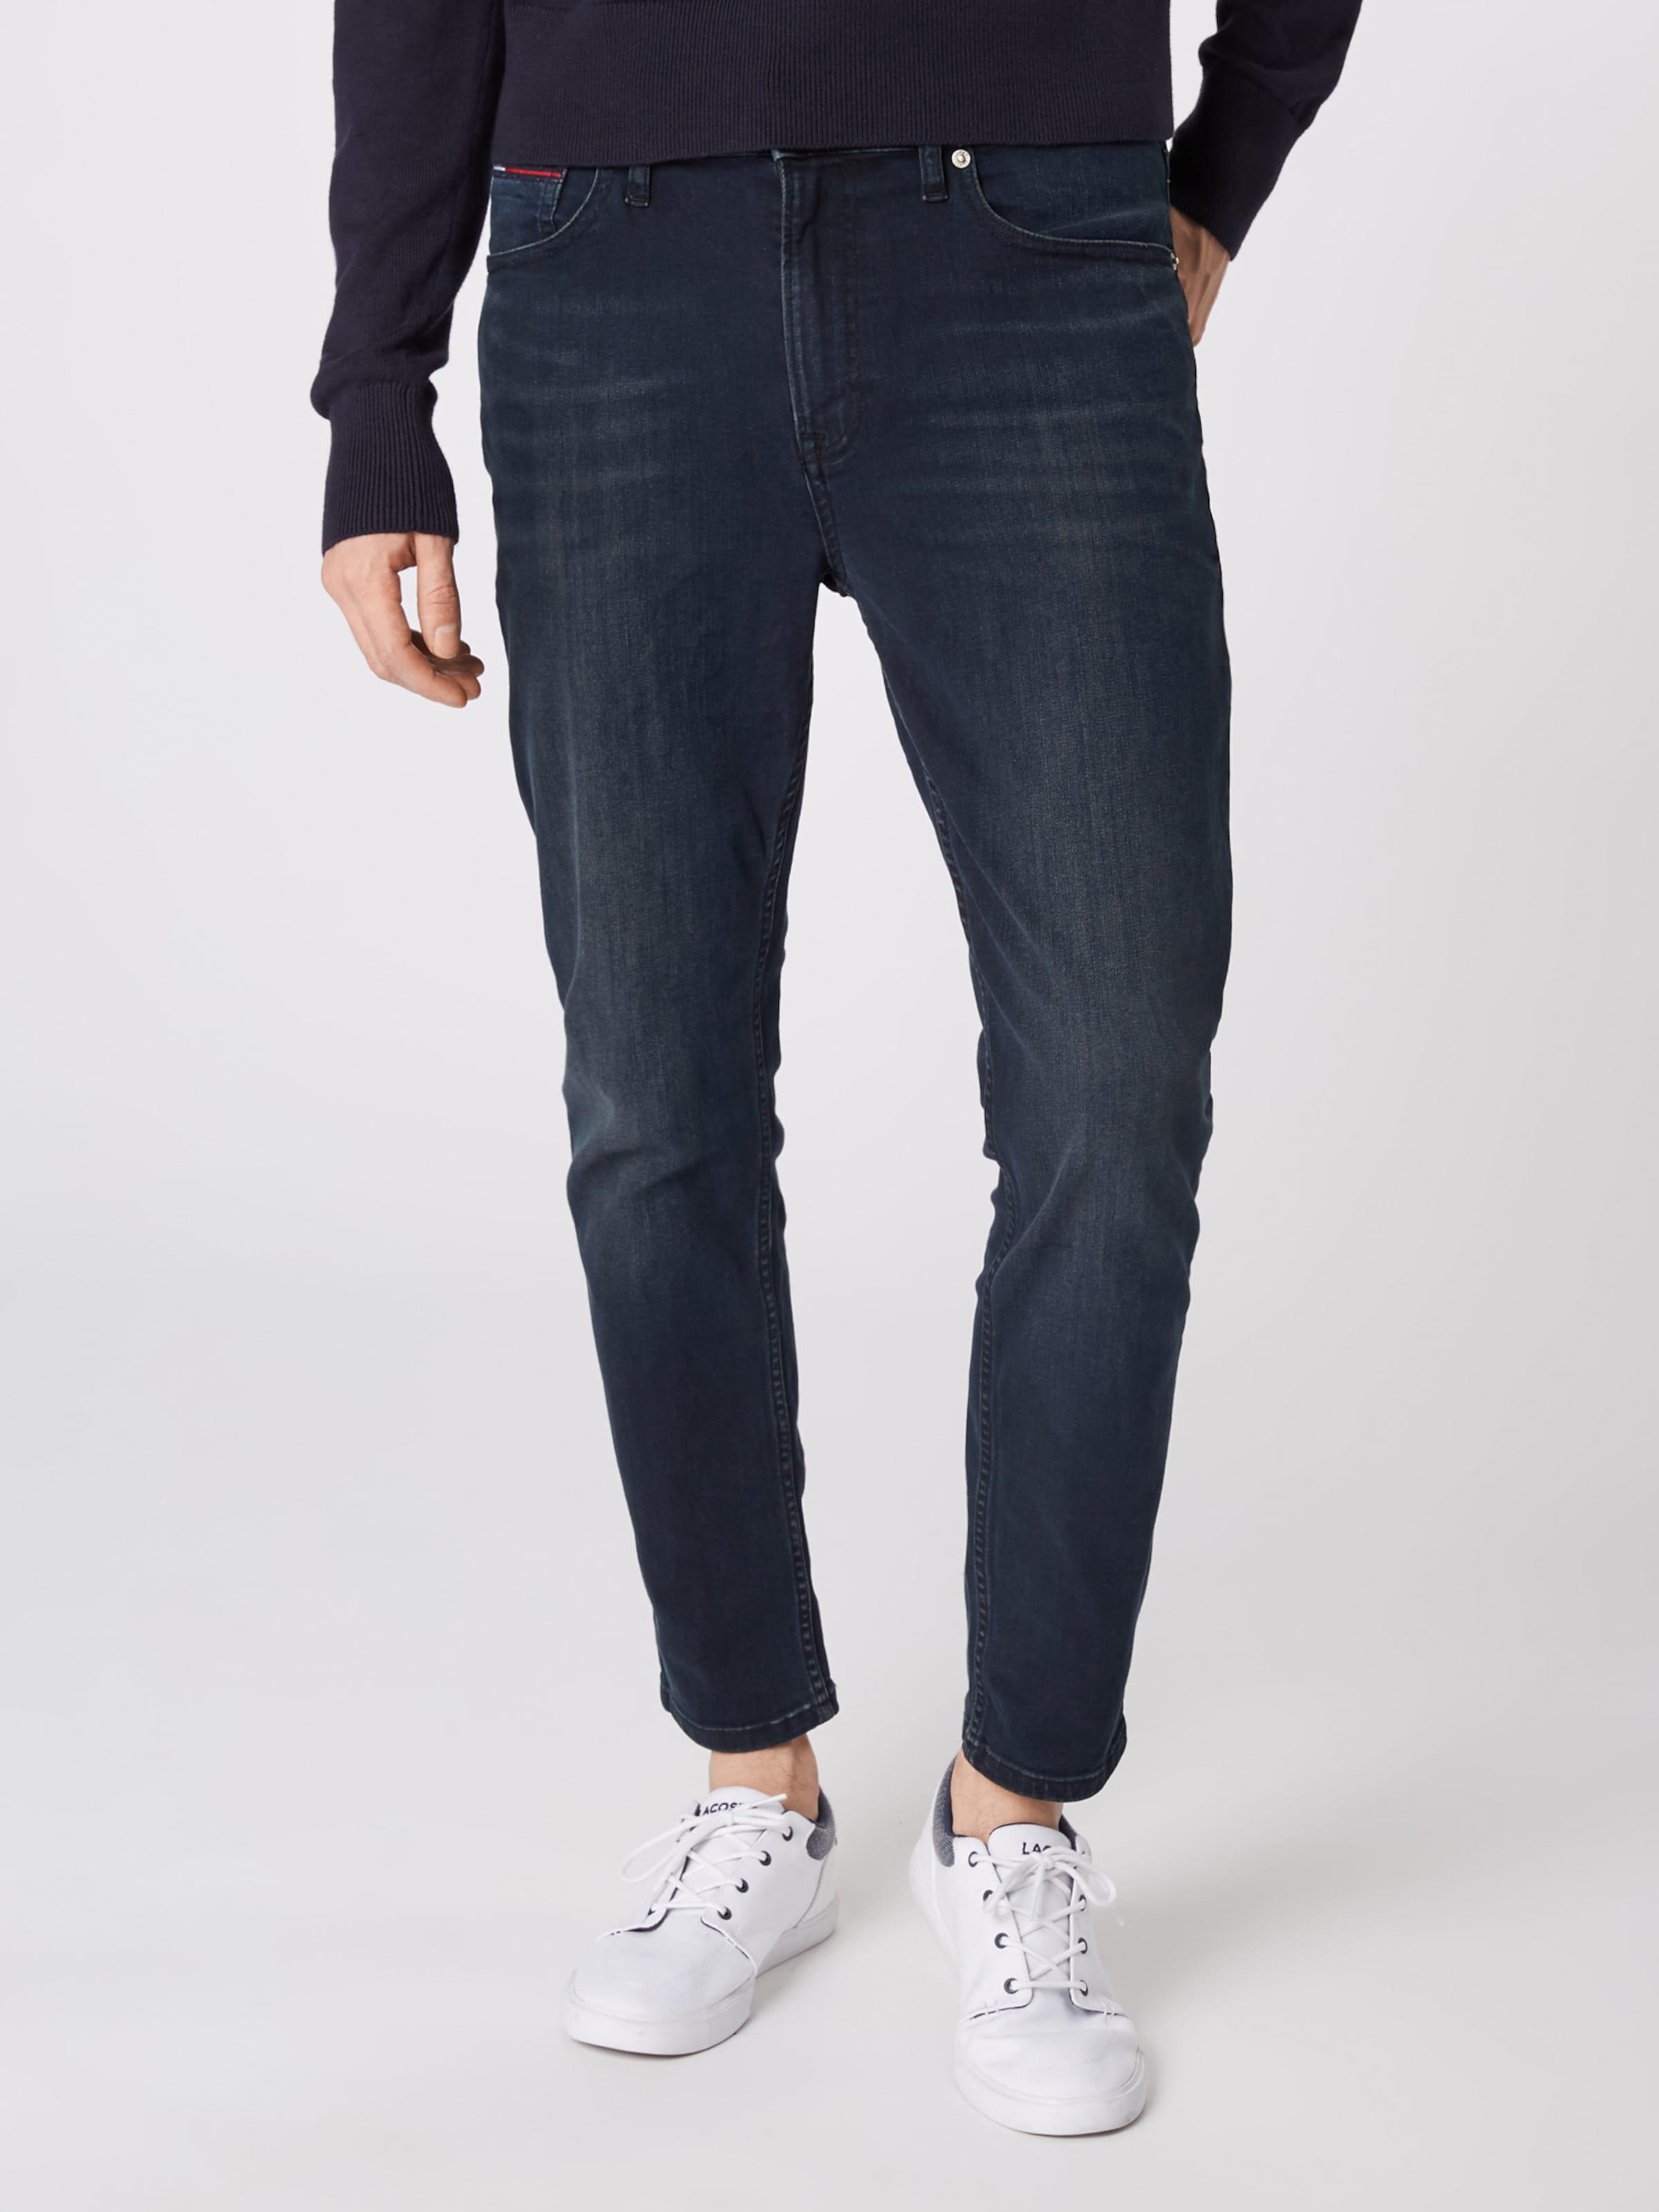 Cobco' Simon Denim Tommy In Jeans 'skinny Blue PXOZkiuT